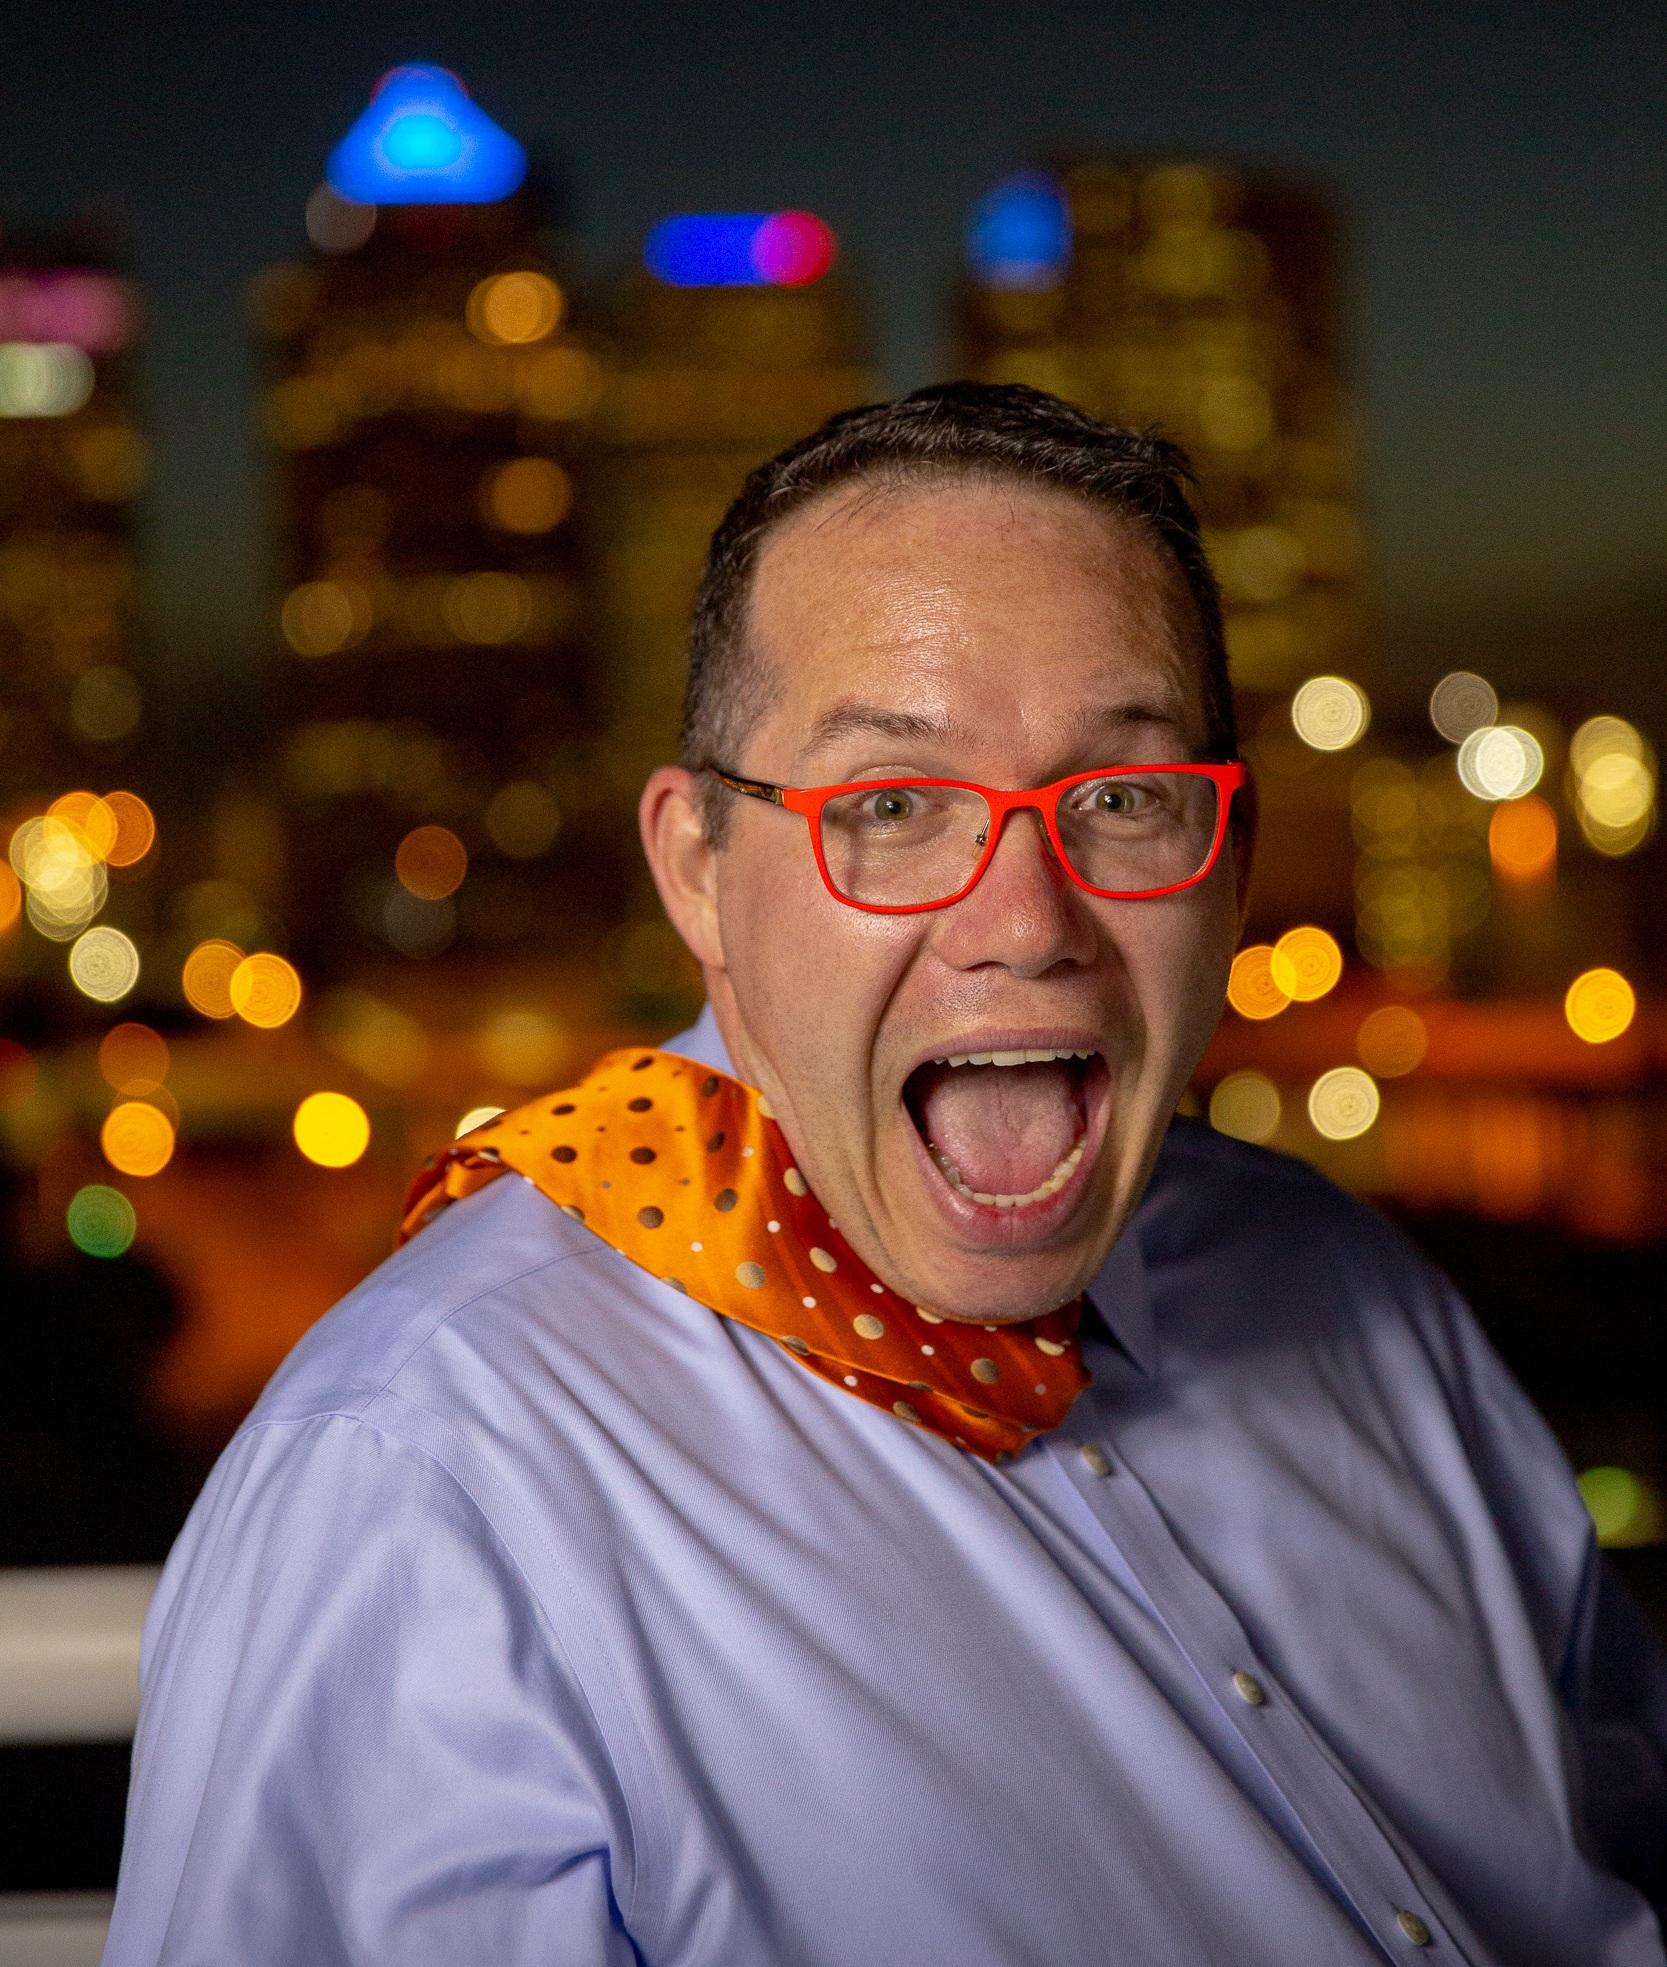 phil gerbyshak crazy tie guy.jpg